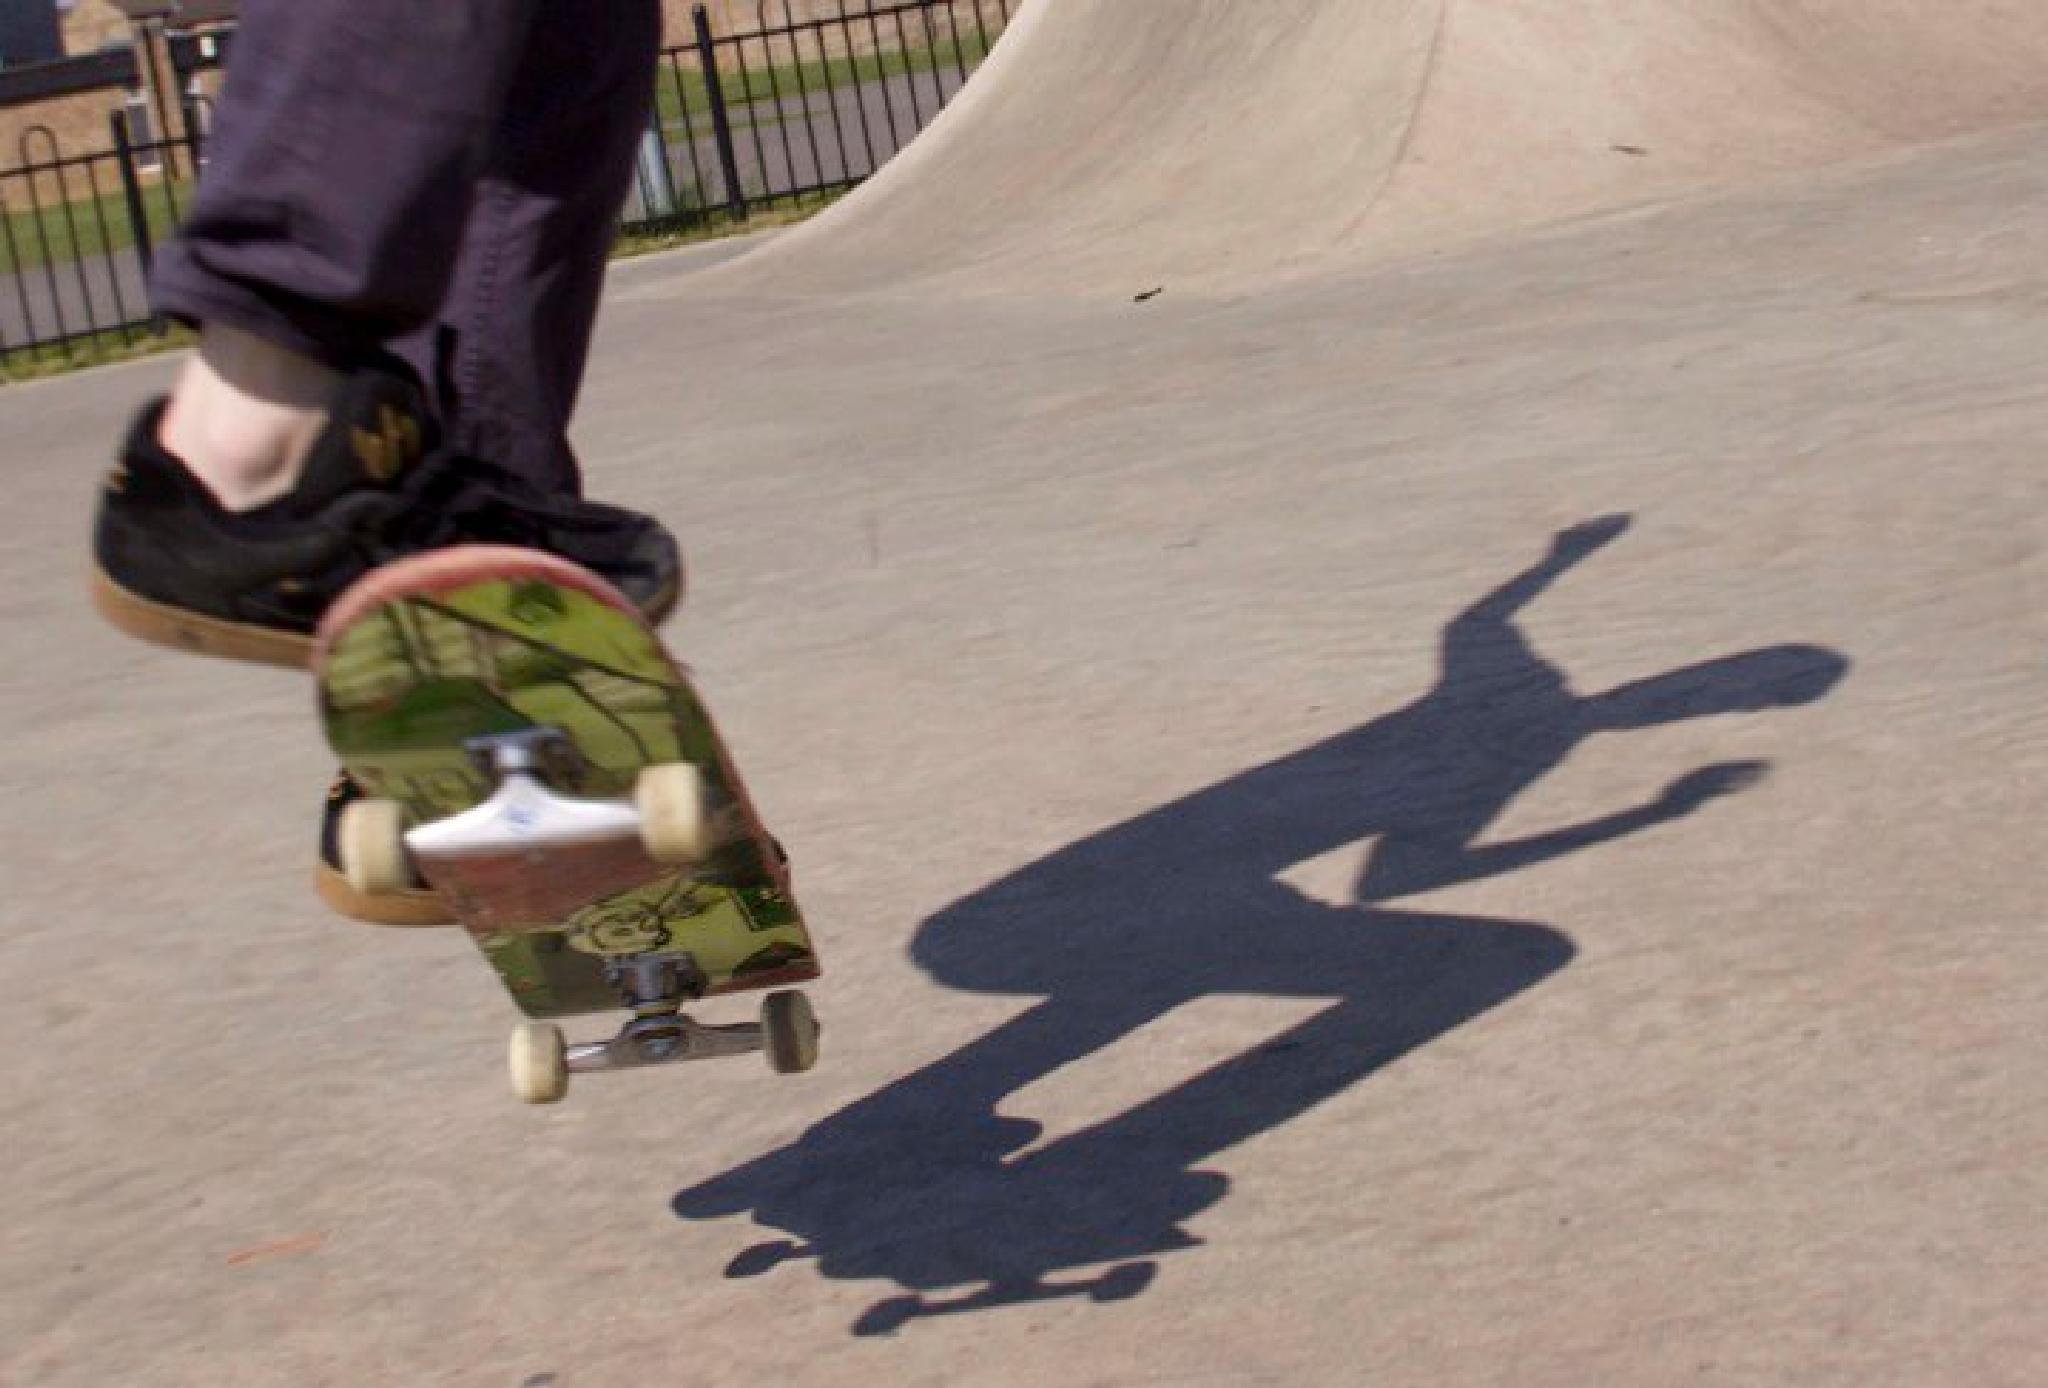 skate shadow by shorey